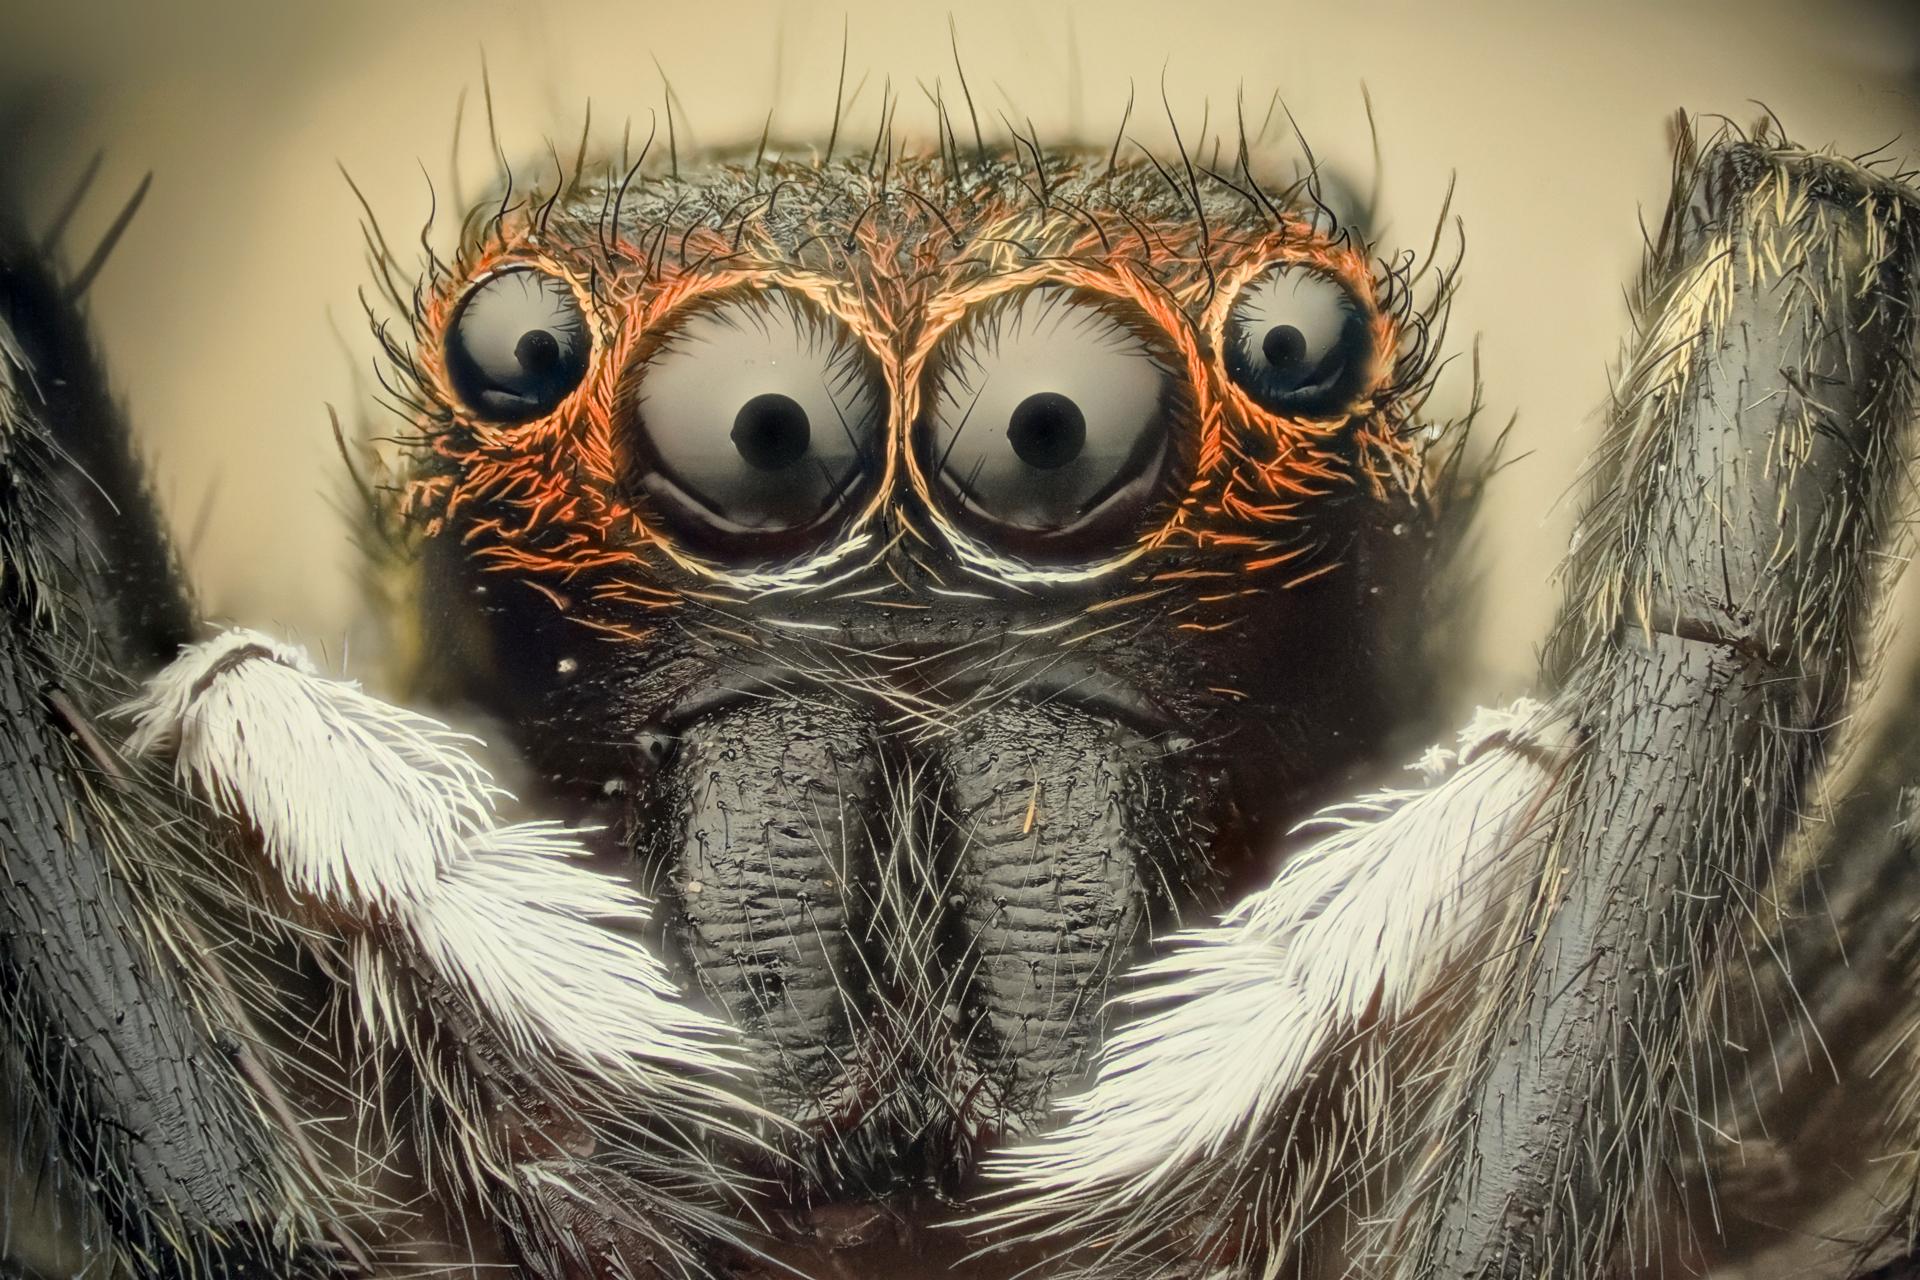 Download Spiders Wallpaper 1920x1280 Wallpoper 290816 1920x1280